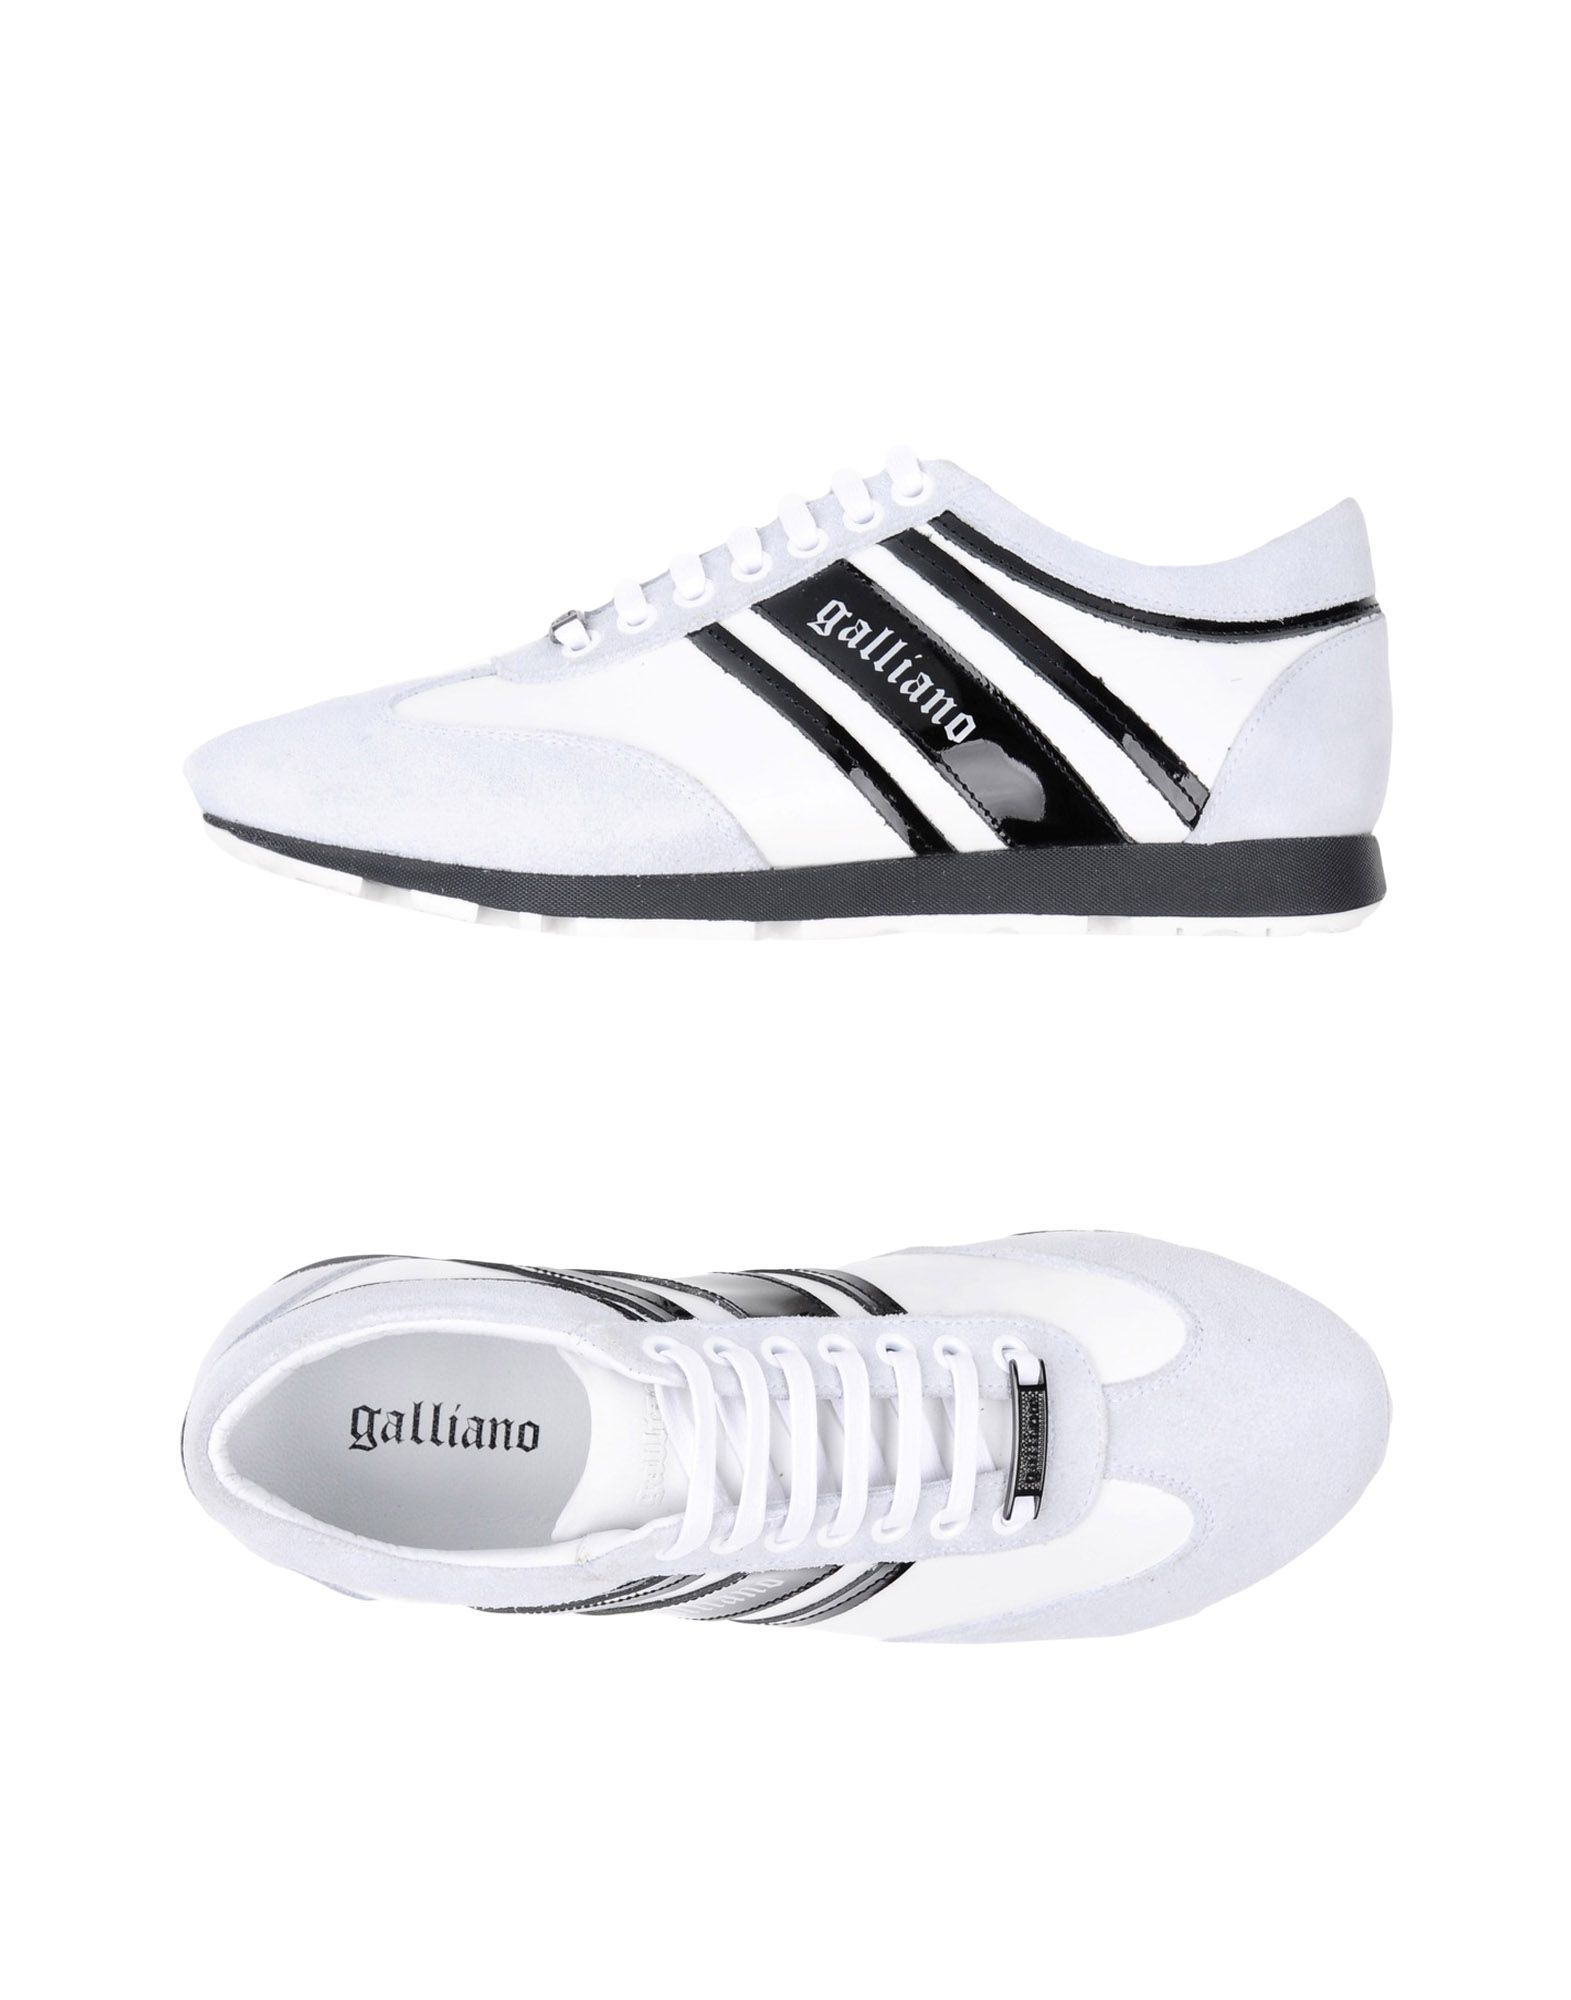 Galliano Herren Sneakers Herren Galliano  11336091CW Heiße Schuhe a0873f